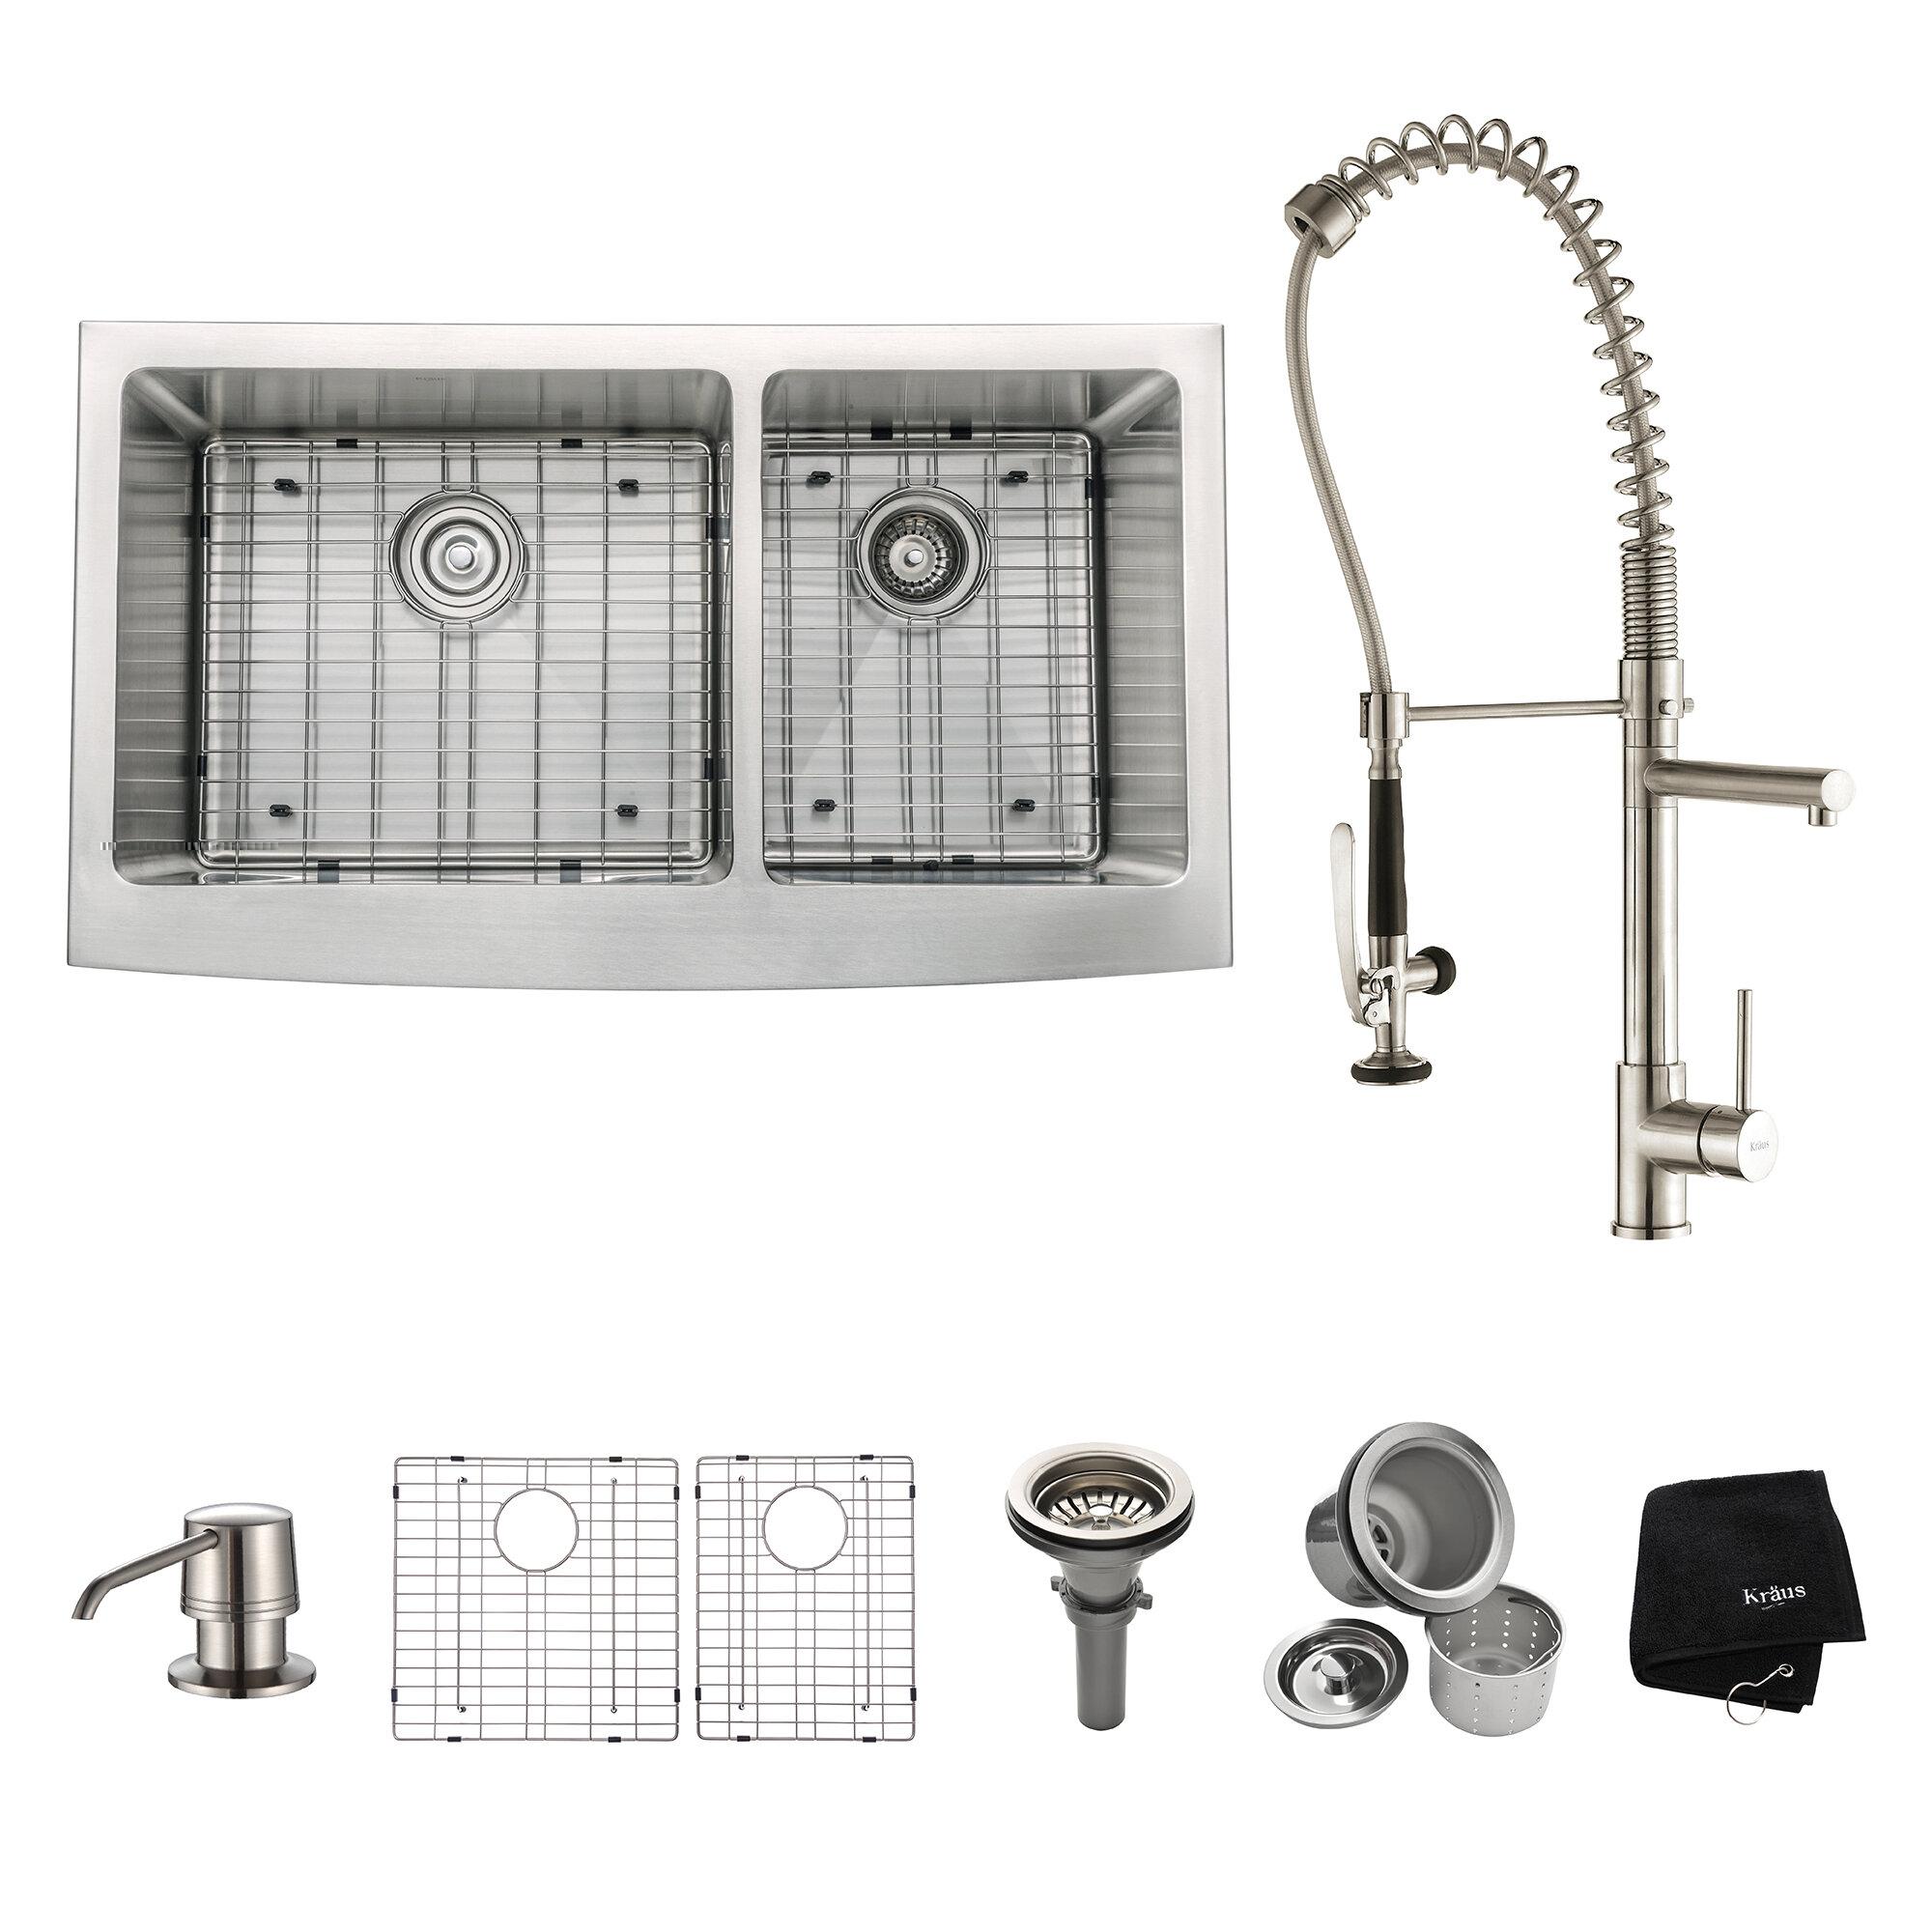 35 9 L X 20 75 W Double Basin Farmhouse Kitchen Sink Set With Kitchen Faucet And Soap Dispenser